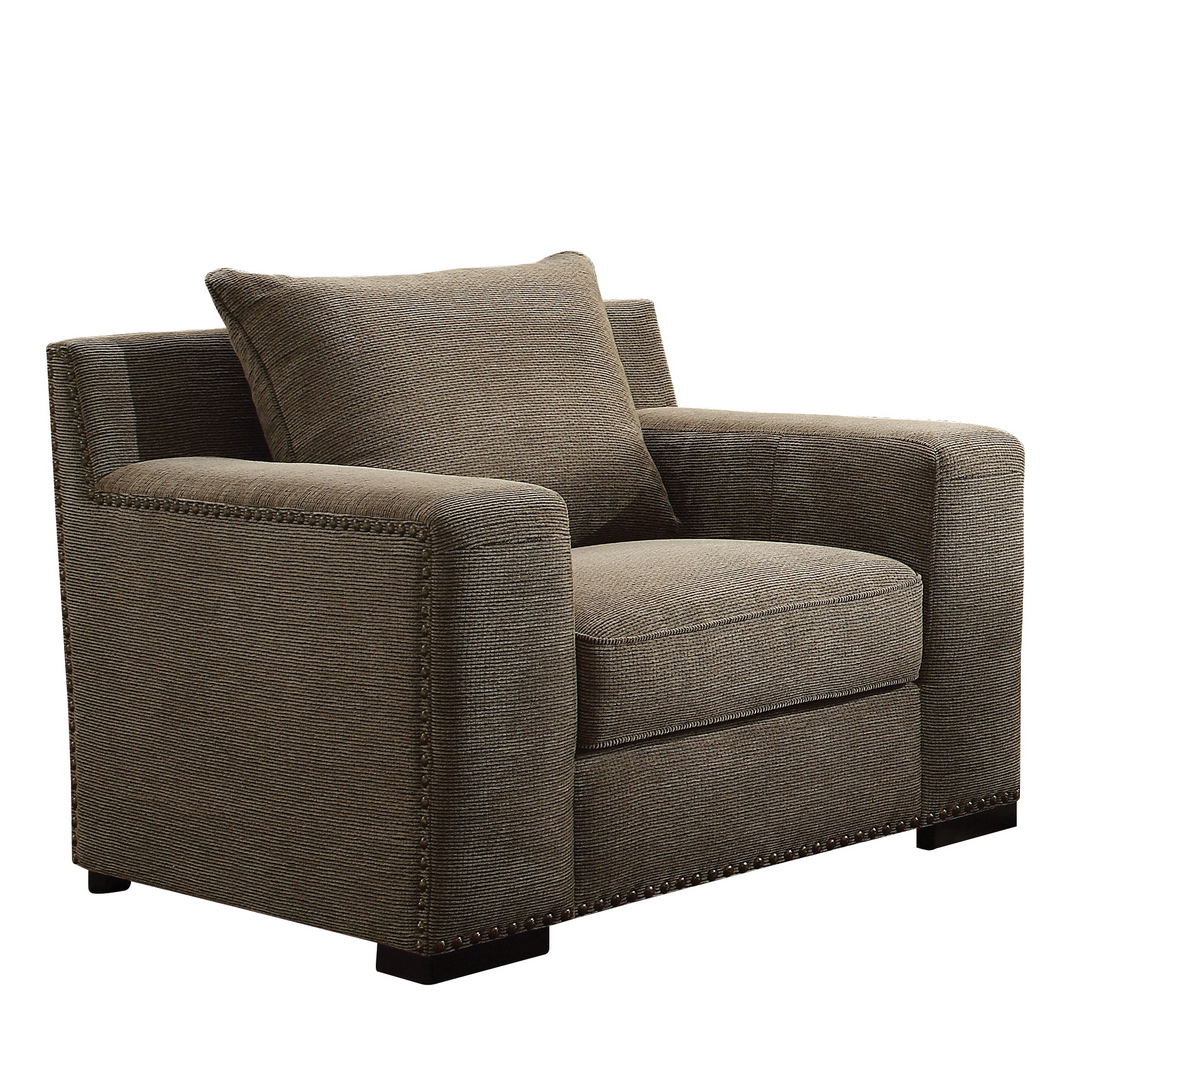 Acme Ushury Chair Gray Chenille